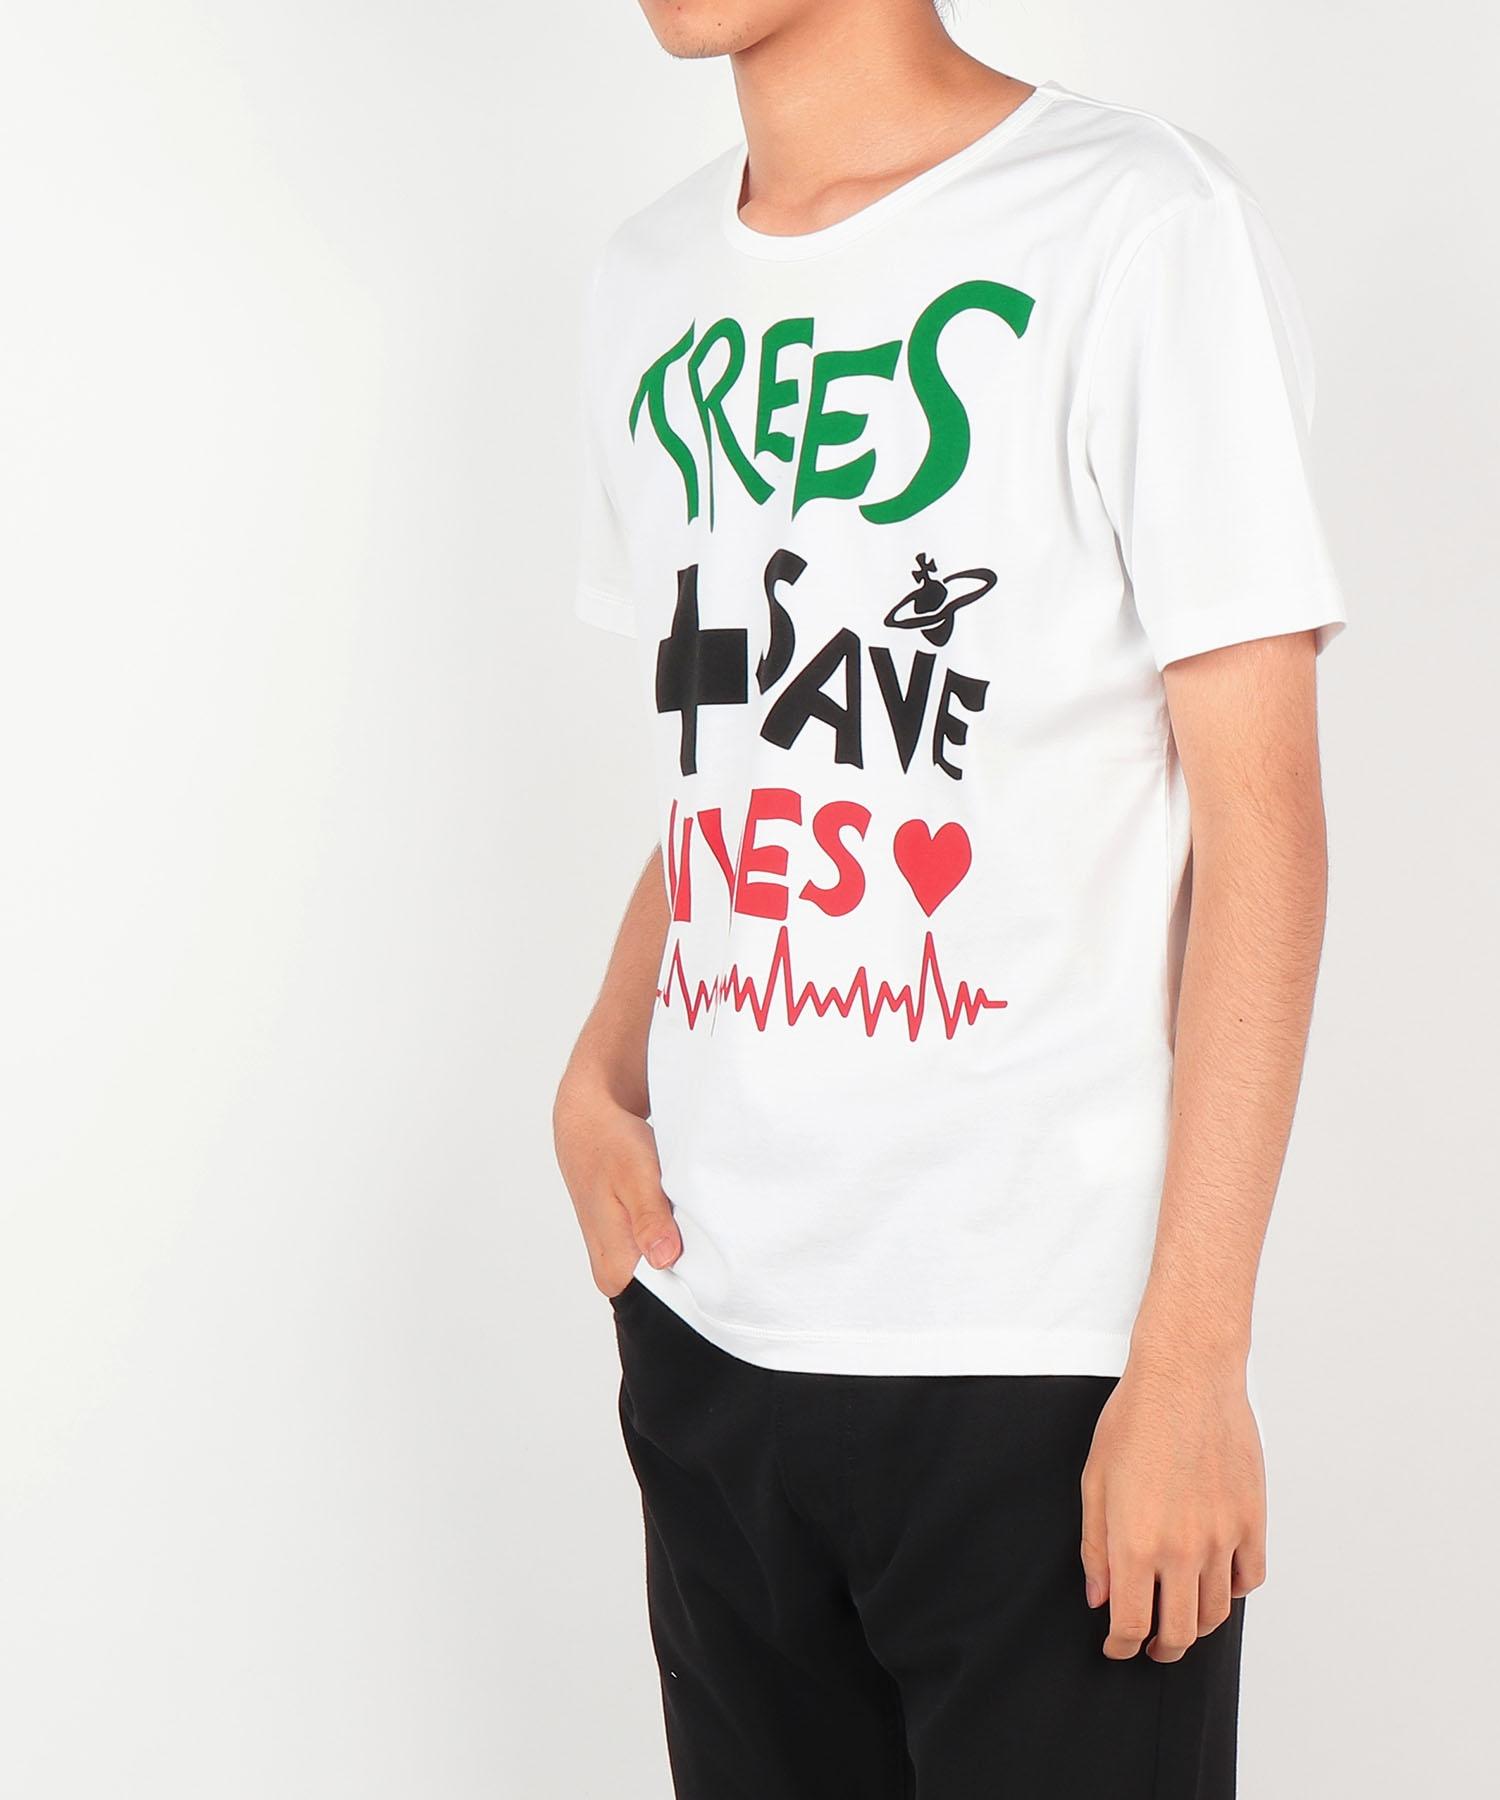 TREES SAVE LIVES 半袖Tシャツ